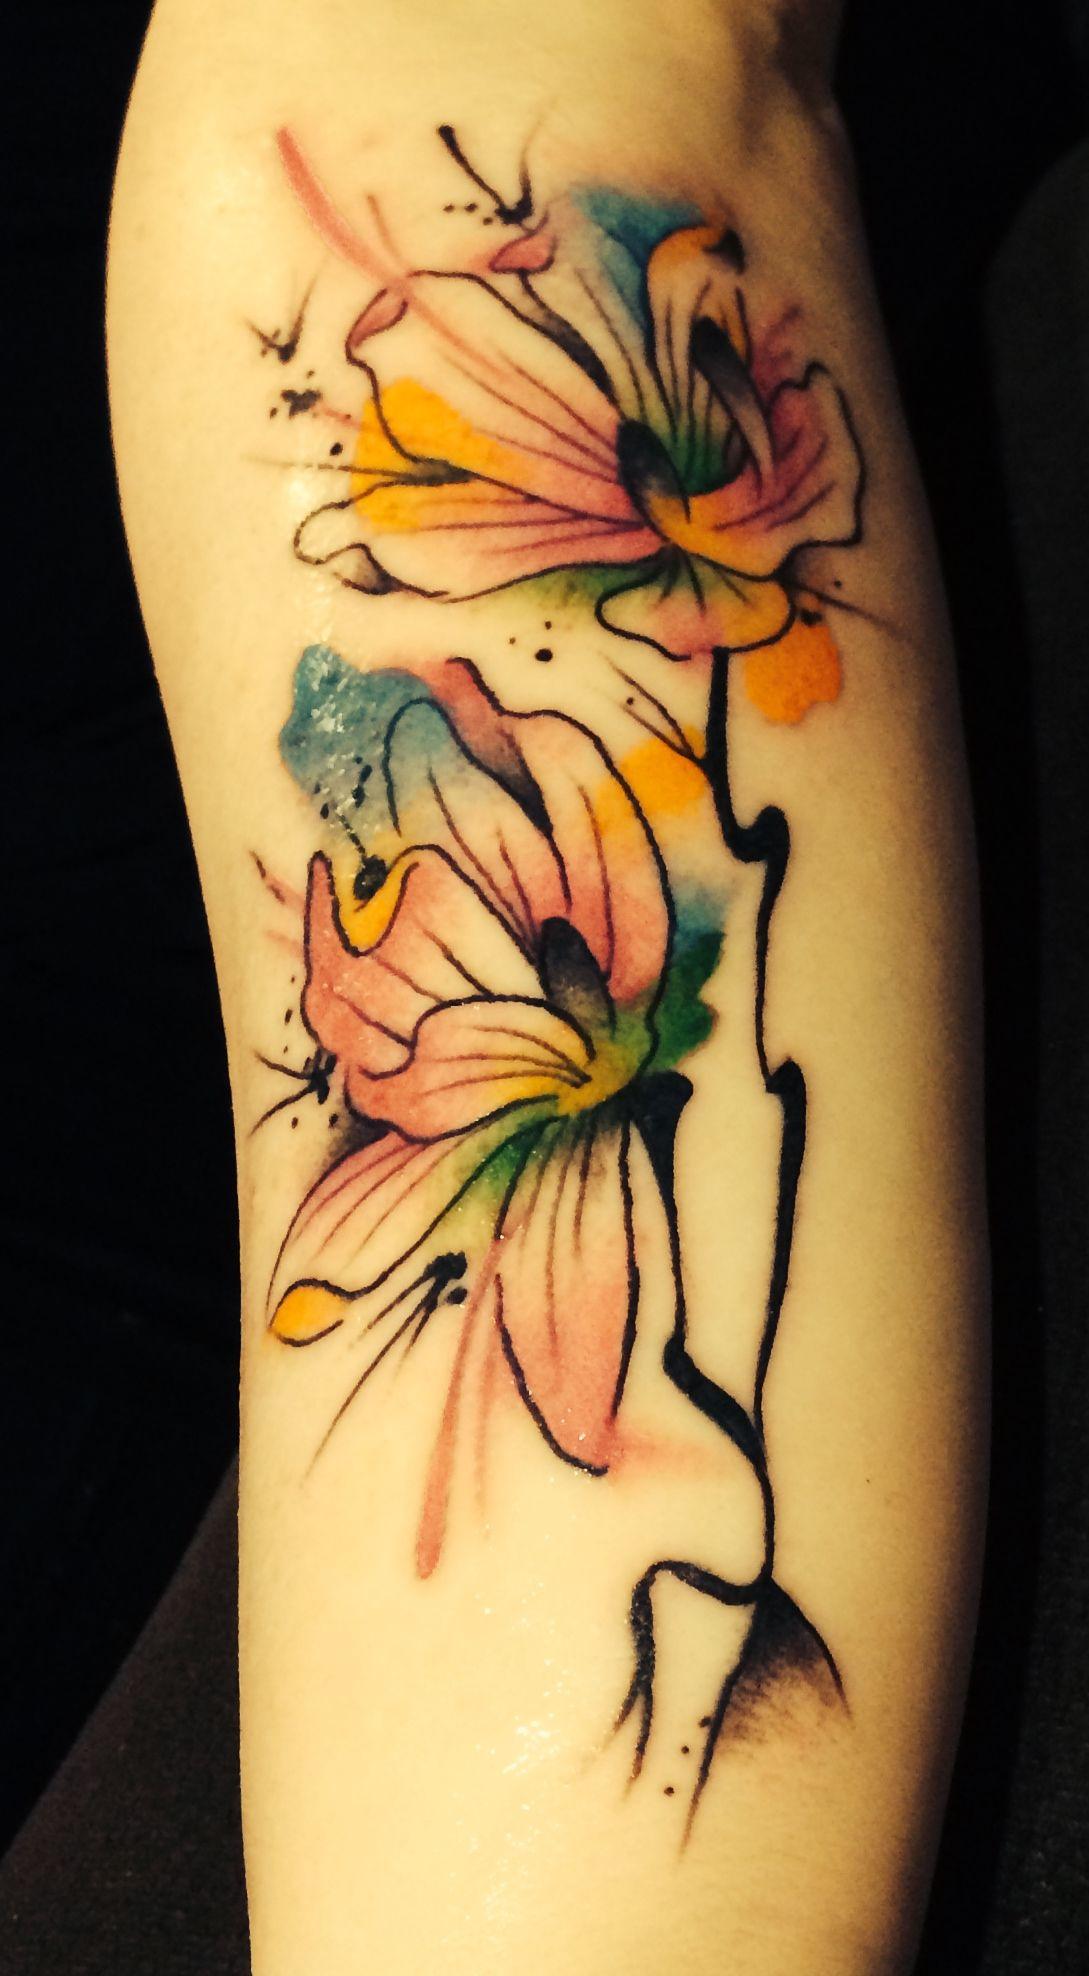 magnolia tree side tattoo - photo #13